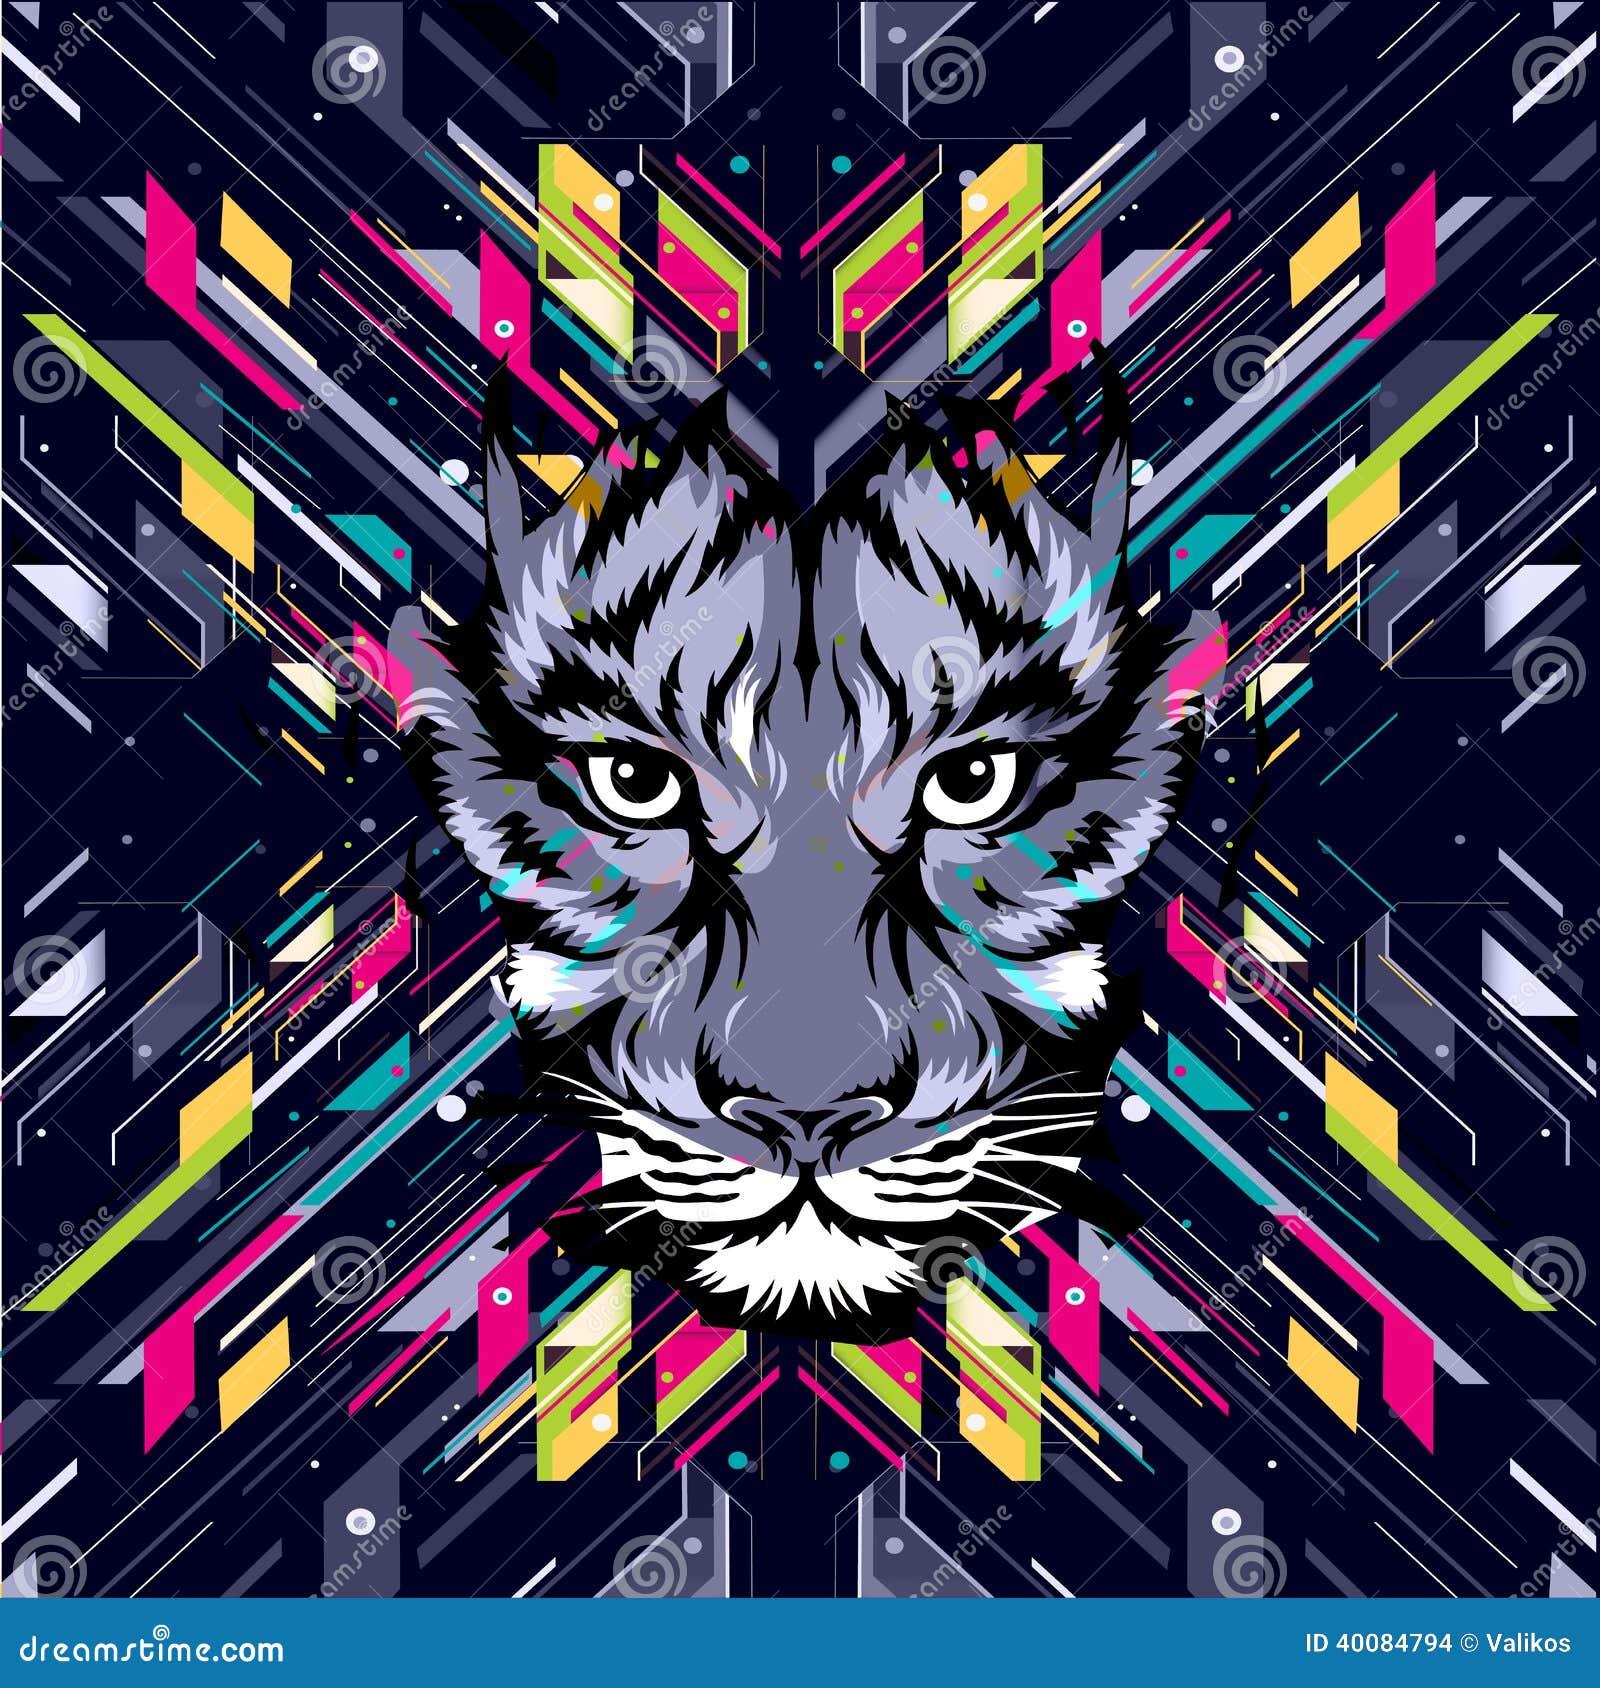 snow leopard digital art